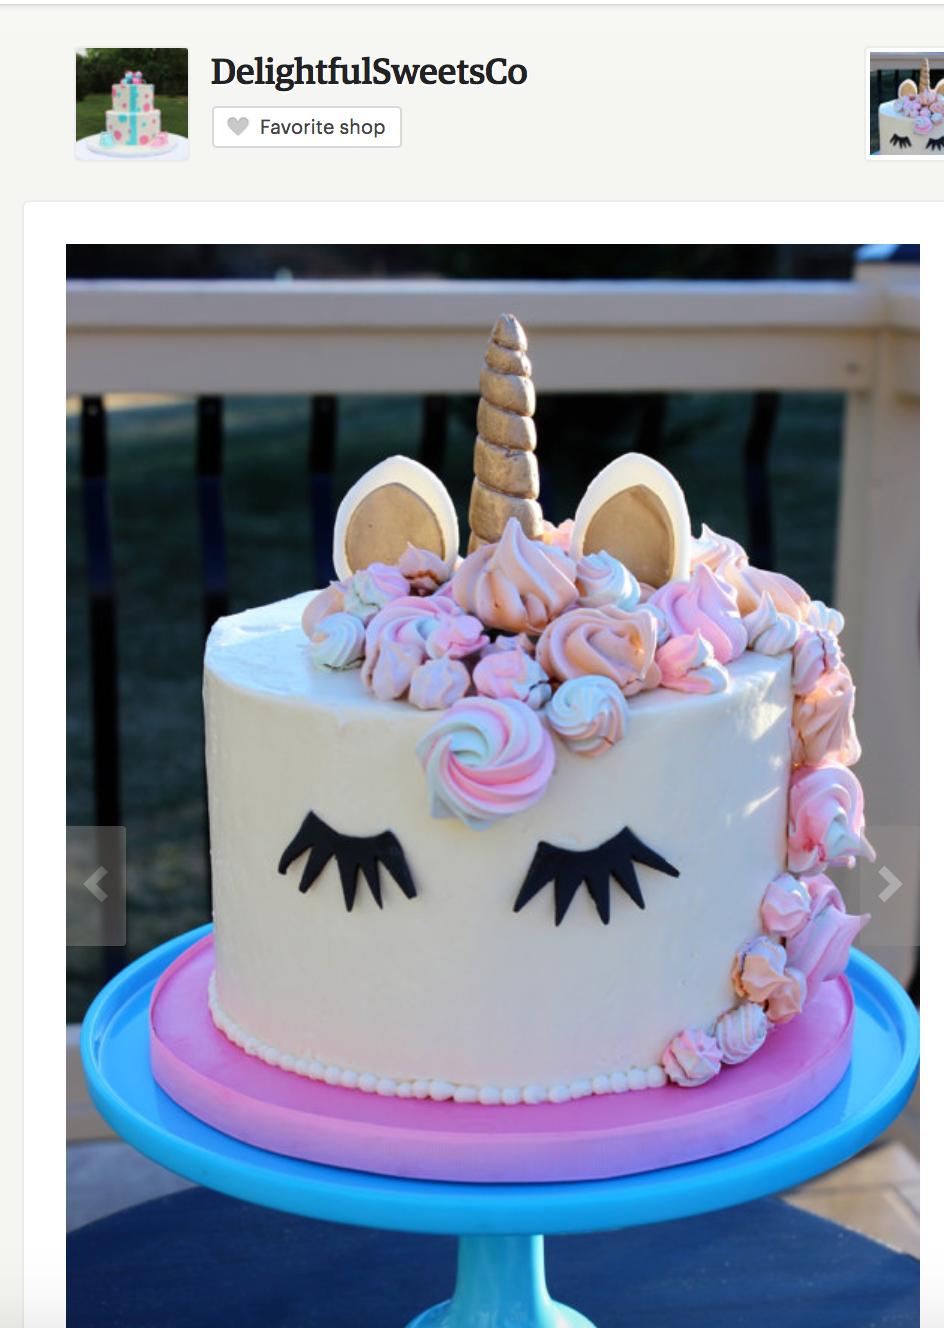 Unicorn Cakes - Unicorn Birthday Party Ideas via frostedMOMS Where to order a magical unicorn cake, unicorn birthday cake